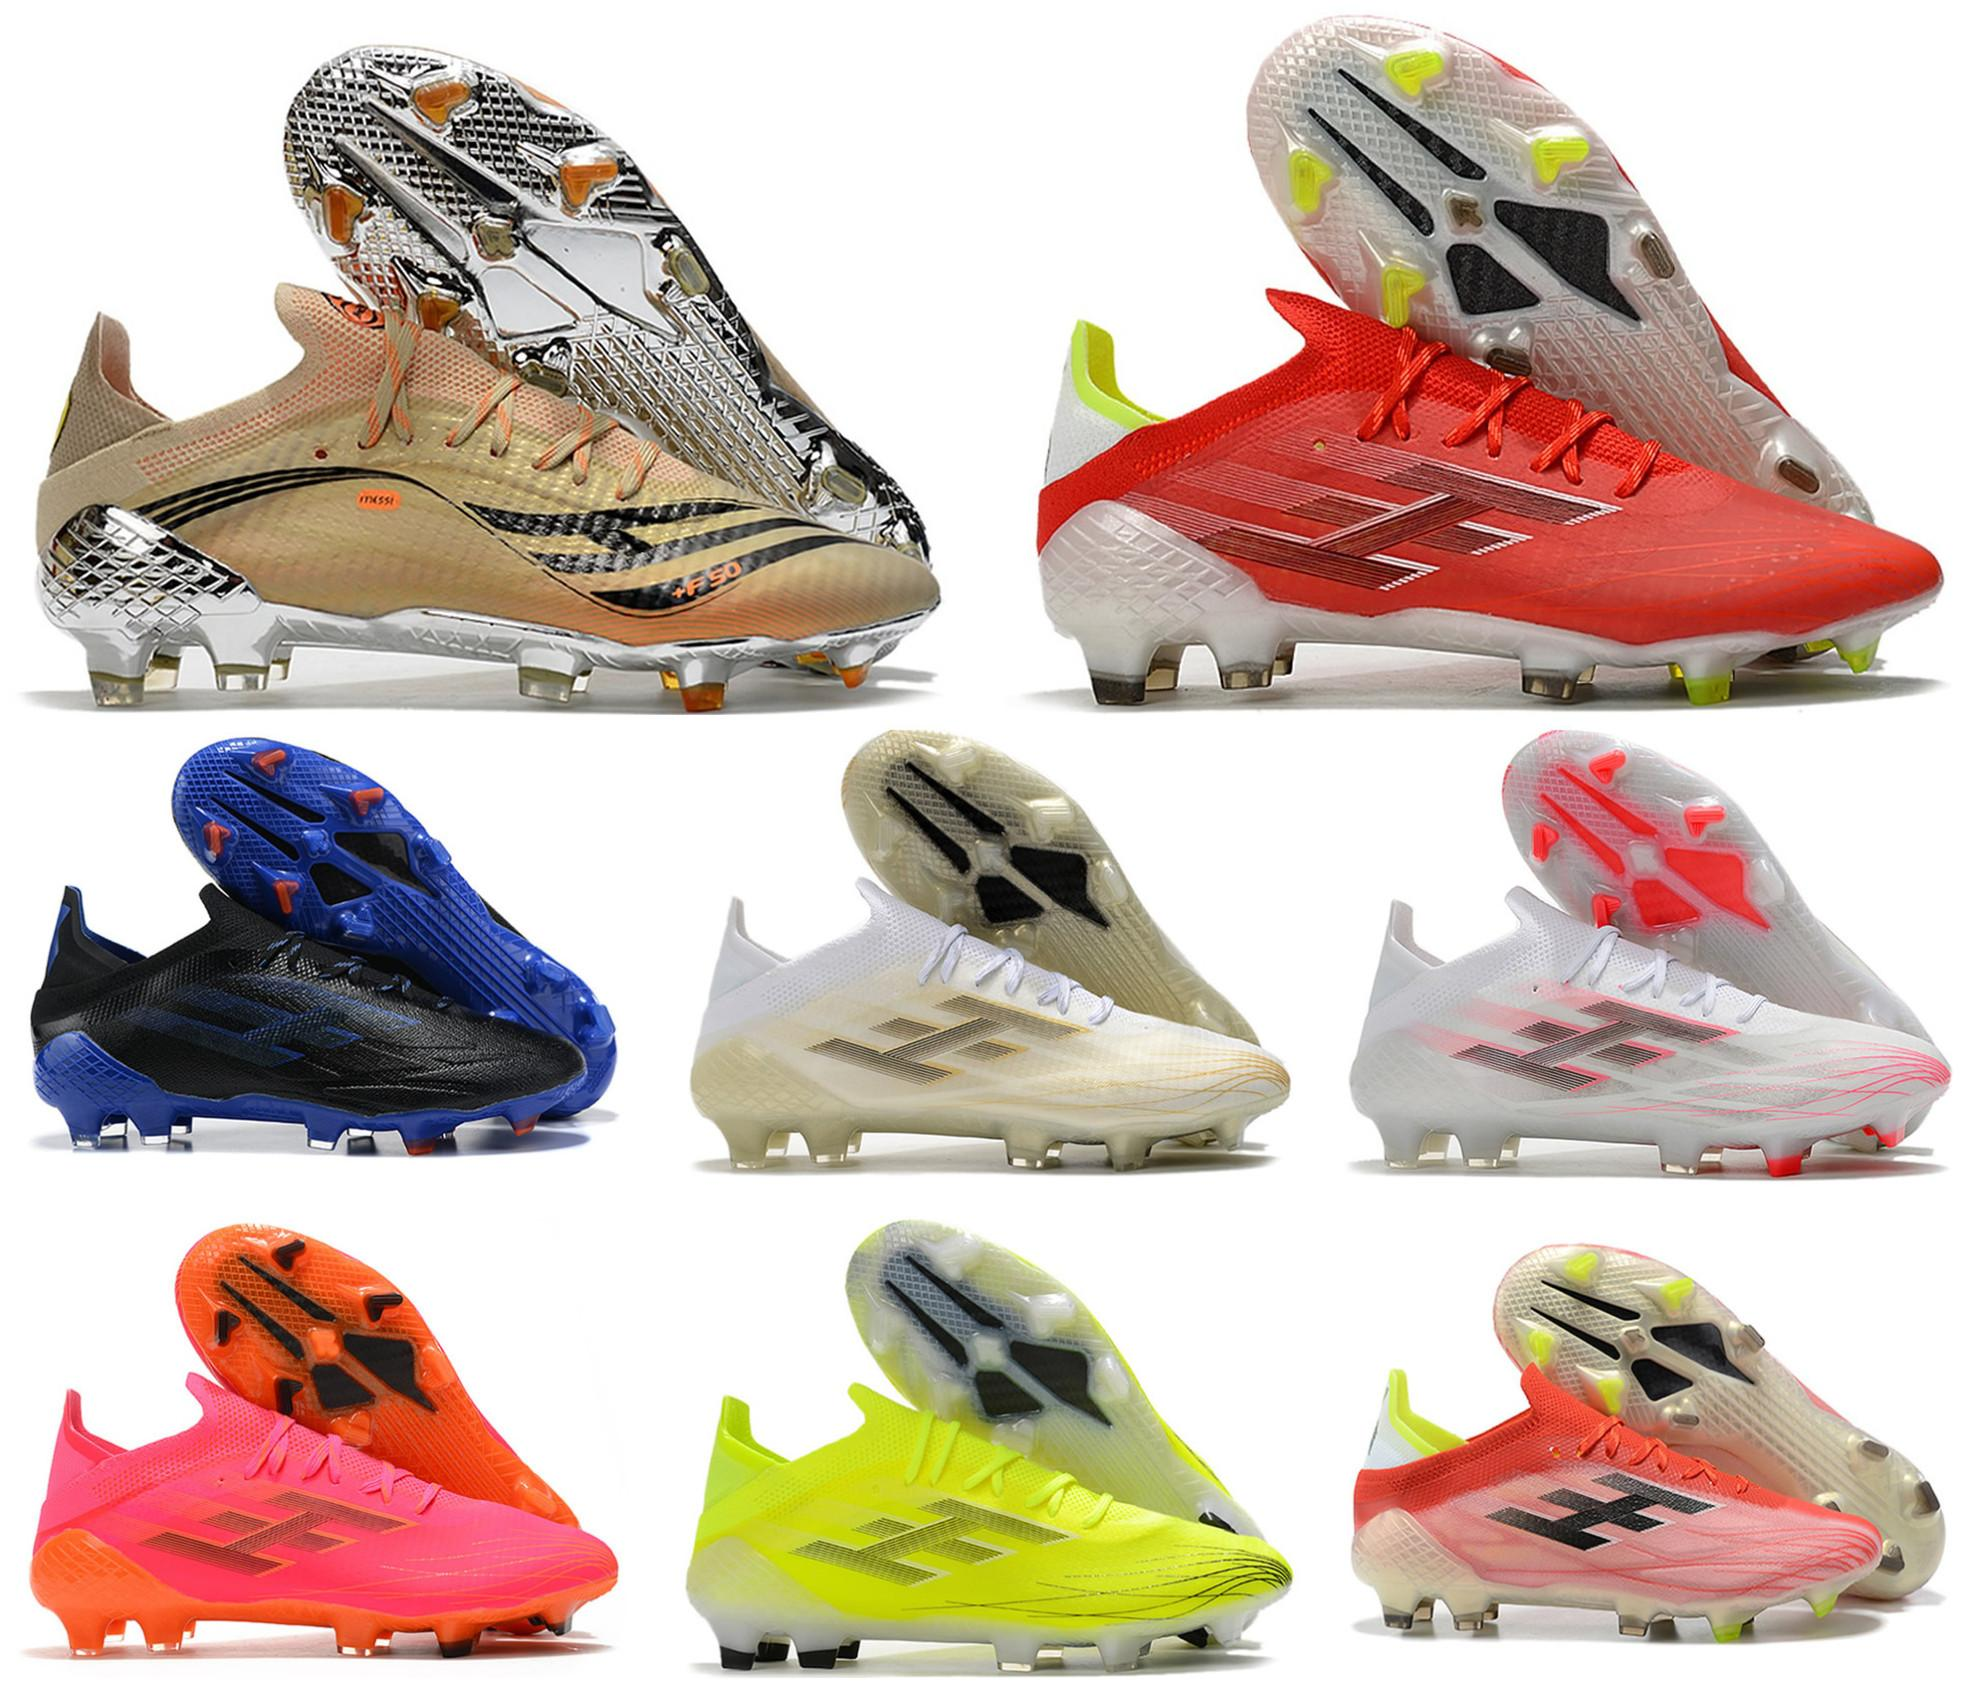 2021 x Speedflow.1 FG F50 El Retorno Messi.1 Erkek Futbol Futbol Ayakkabı Kaçış Işık Redcore BlackSolar Meteorit Paketi Speedflow Boots Cleats Boyut US 6.5-11